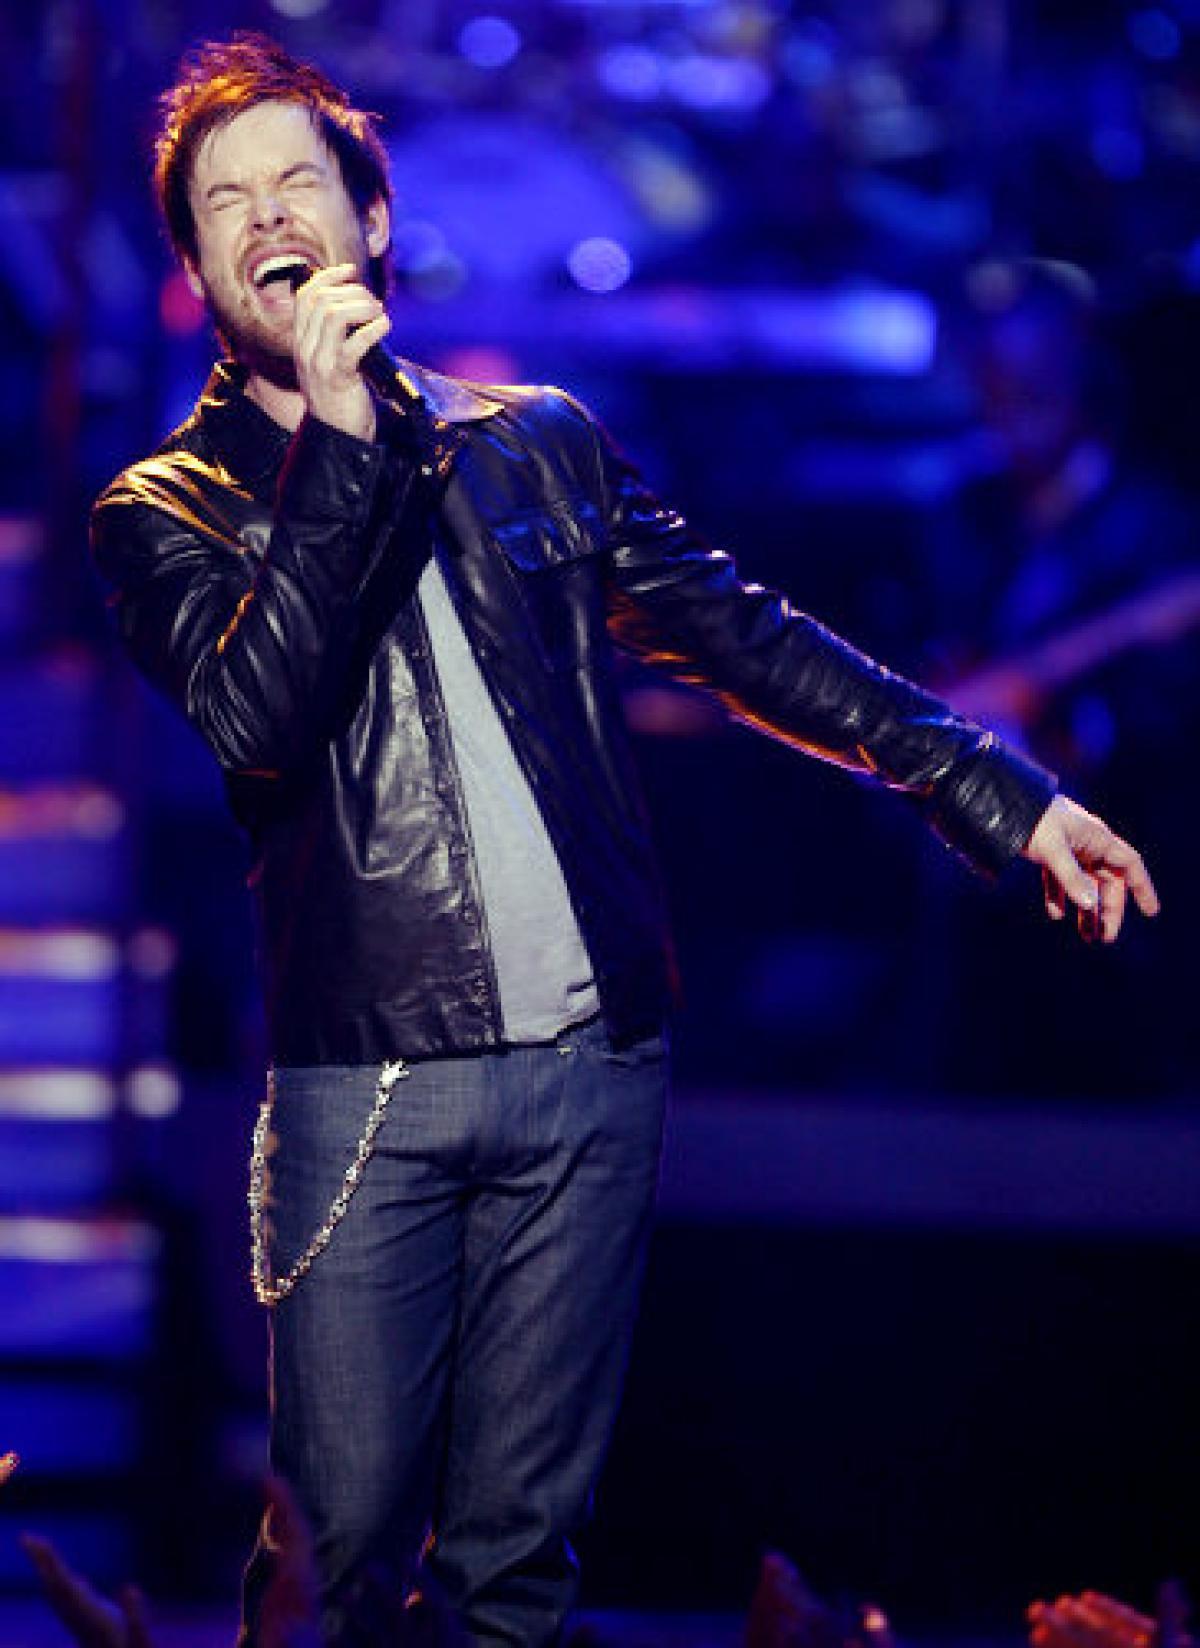 2016 Idols Winner Gal Idol David Cook Jpg